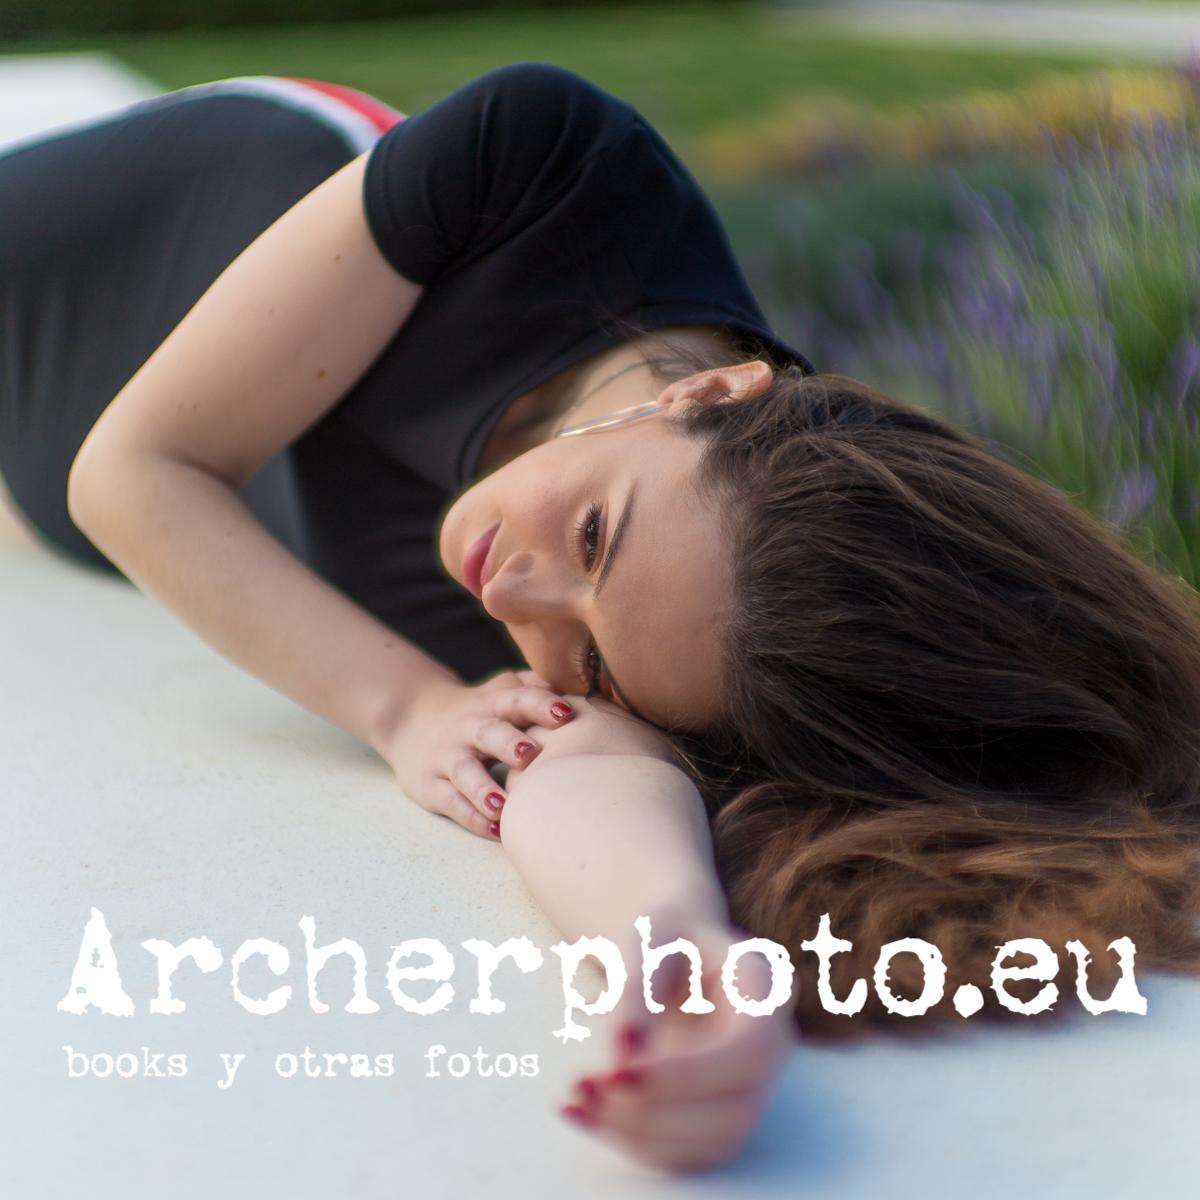 Cintia, April (3), por Archerphoto, fotografia Valencia